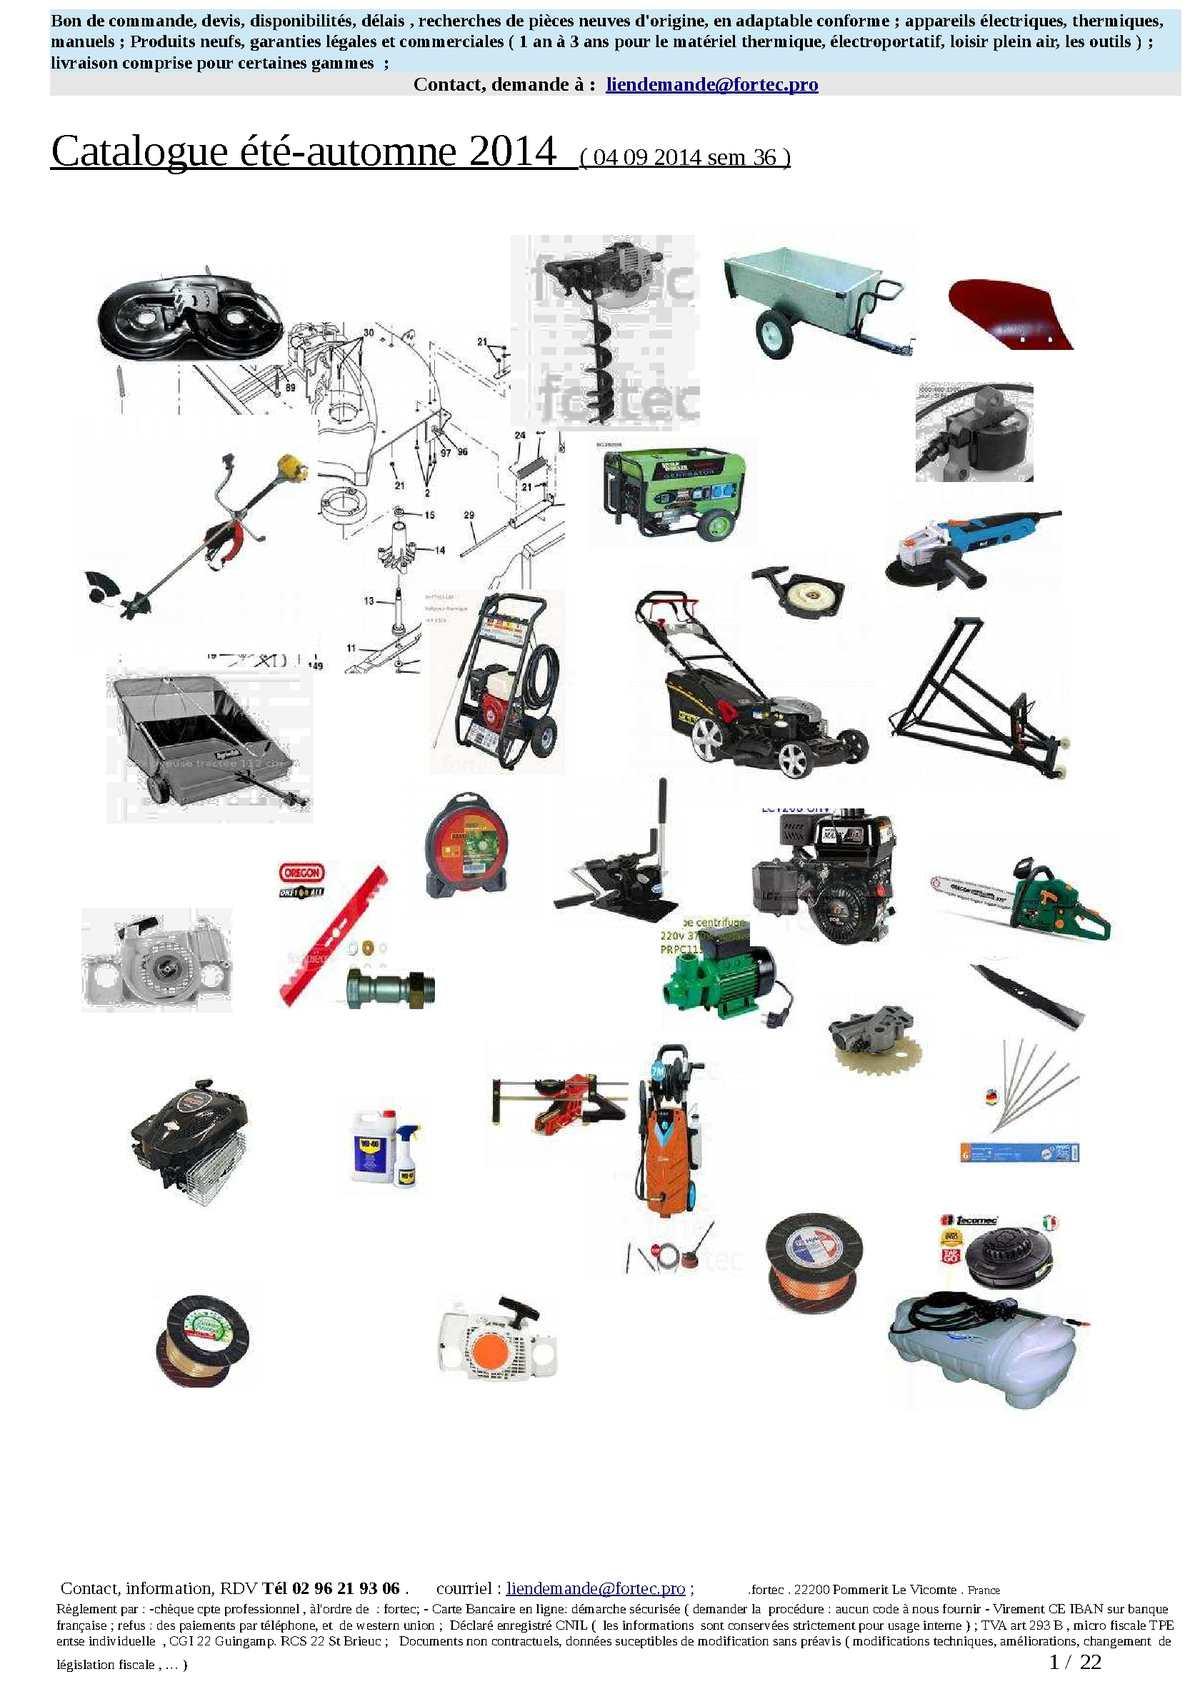 Calaméo - Catalogue Été-Automne 2014, Motoculture, Jardin ... tout Materiel De Jardin Discount